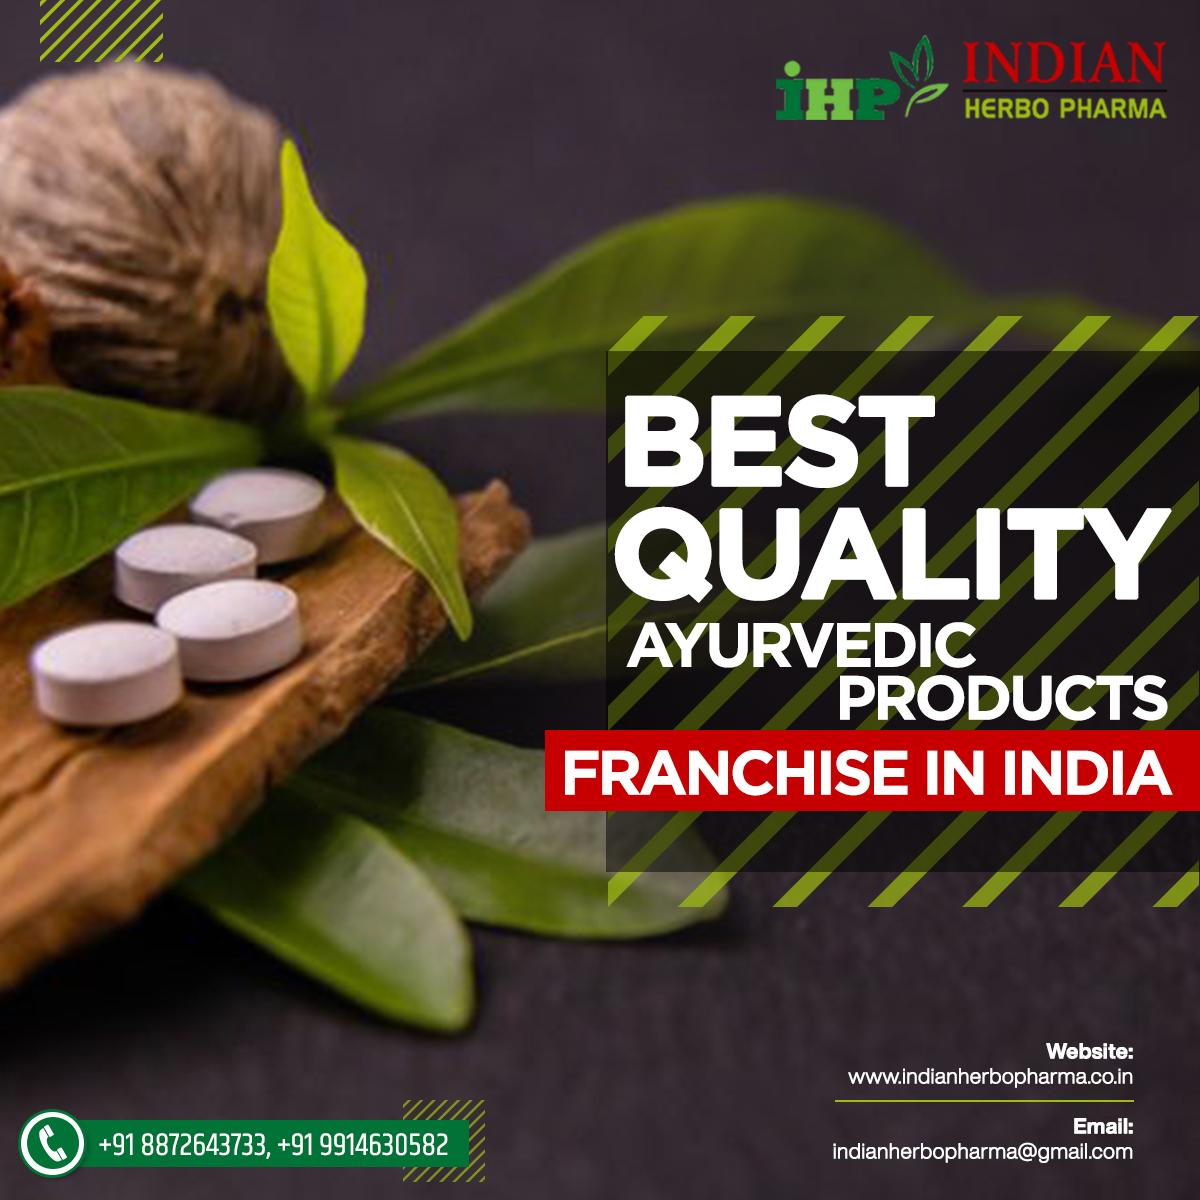 Indian Herbo Pharma